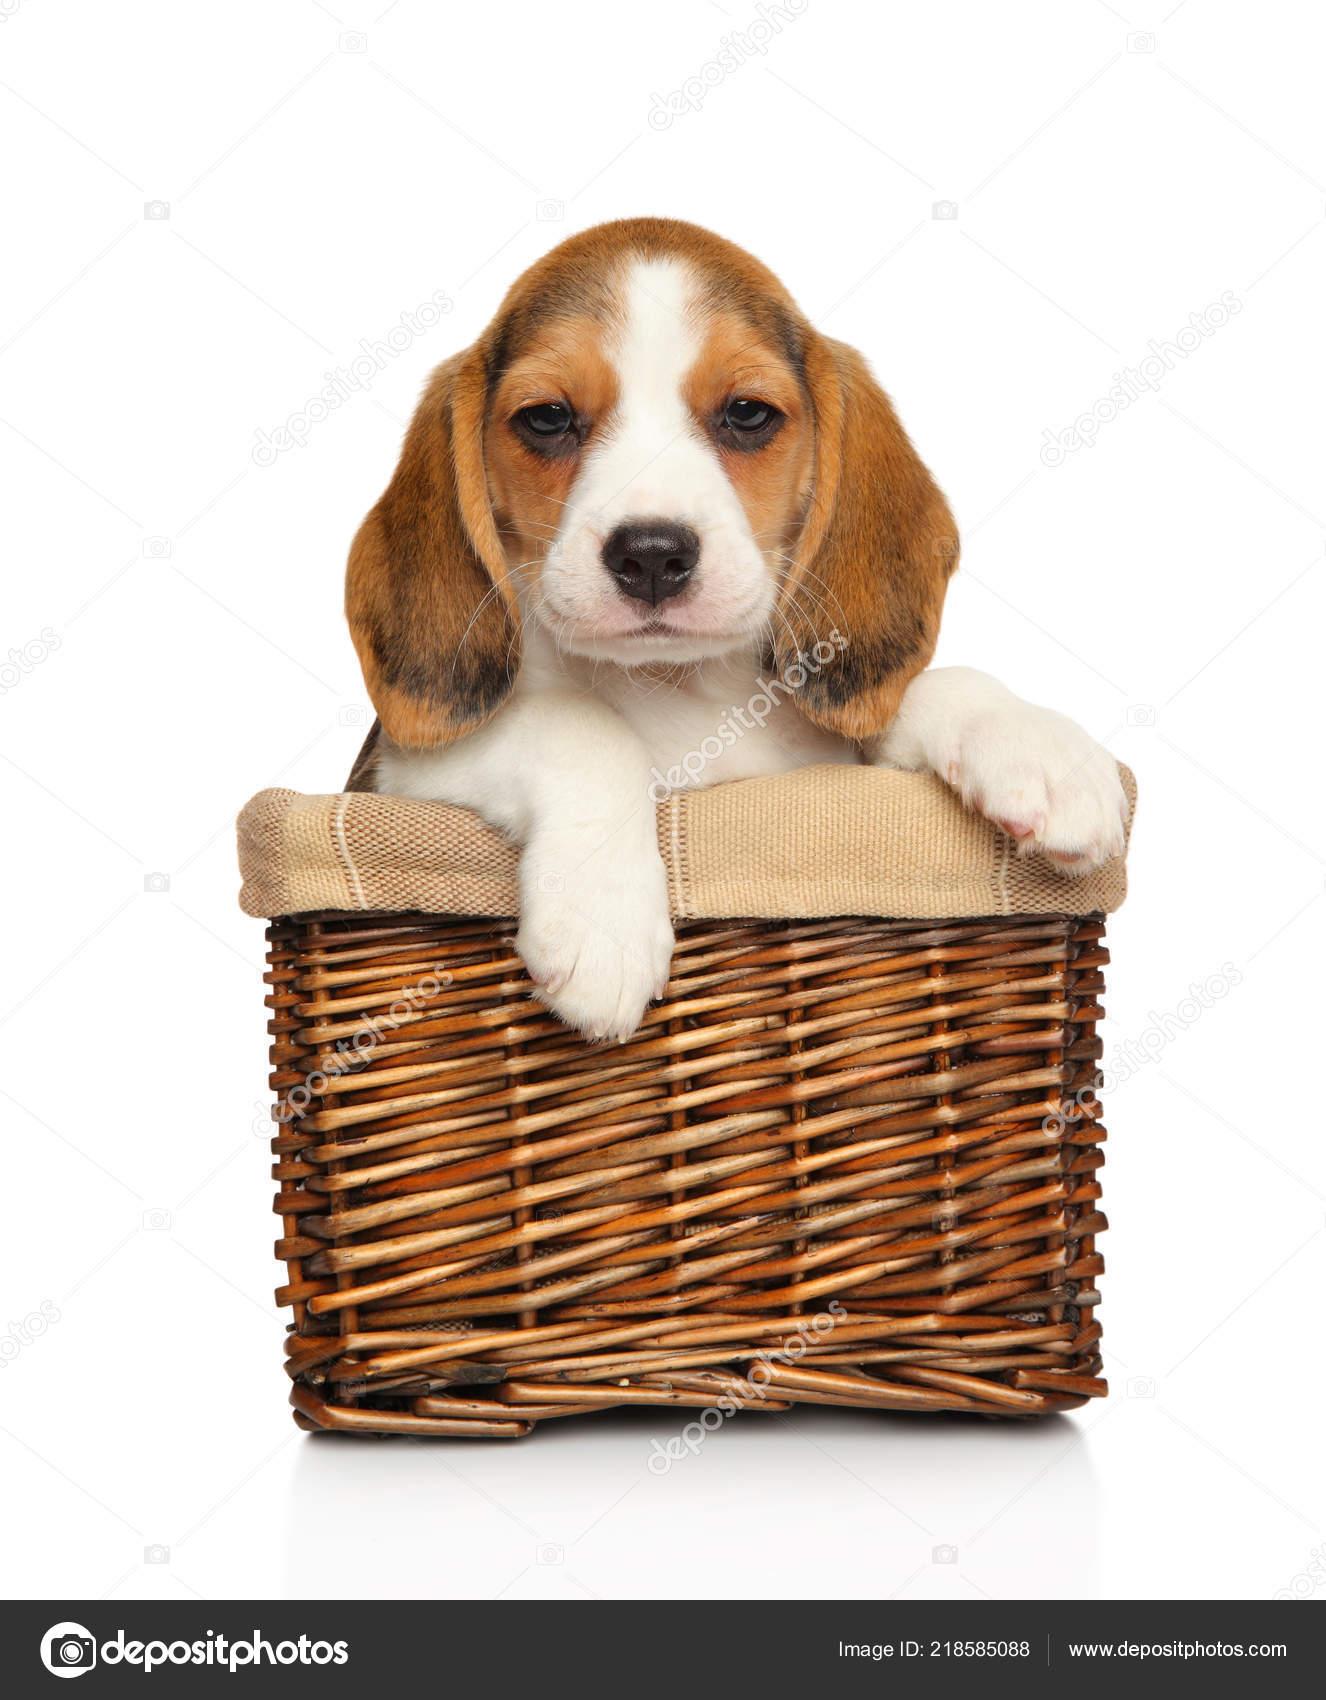 Beagle Puppy Wicker Basket White Background Baby Animal Theme Stock Photo C Fotojagodka 218585088